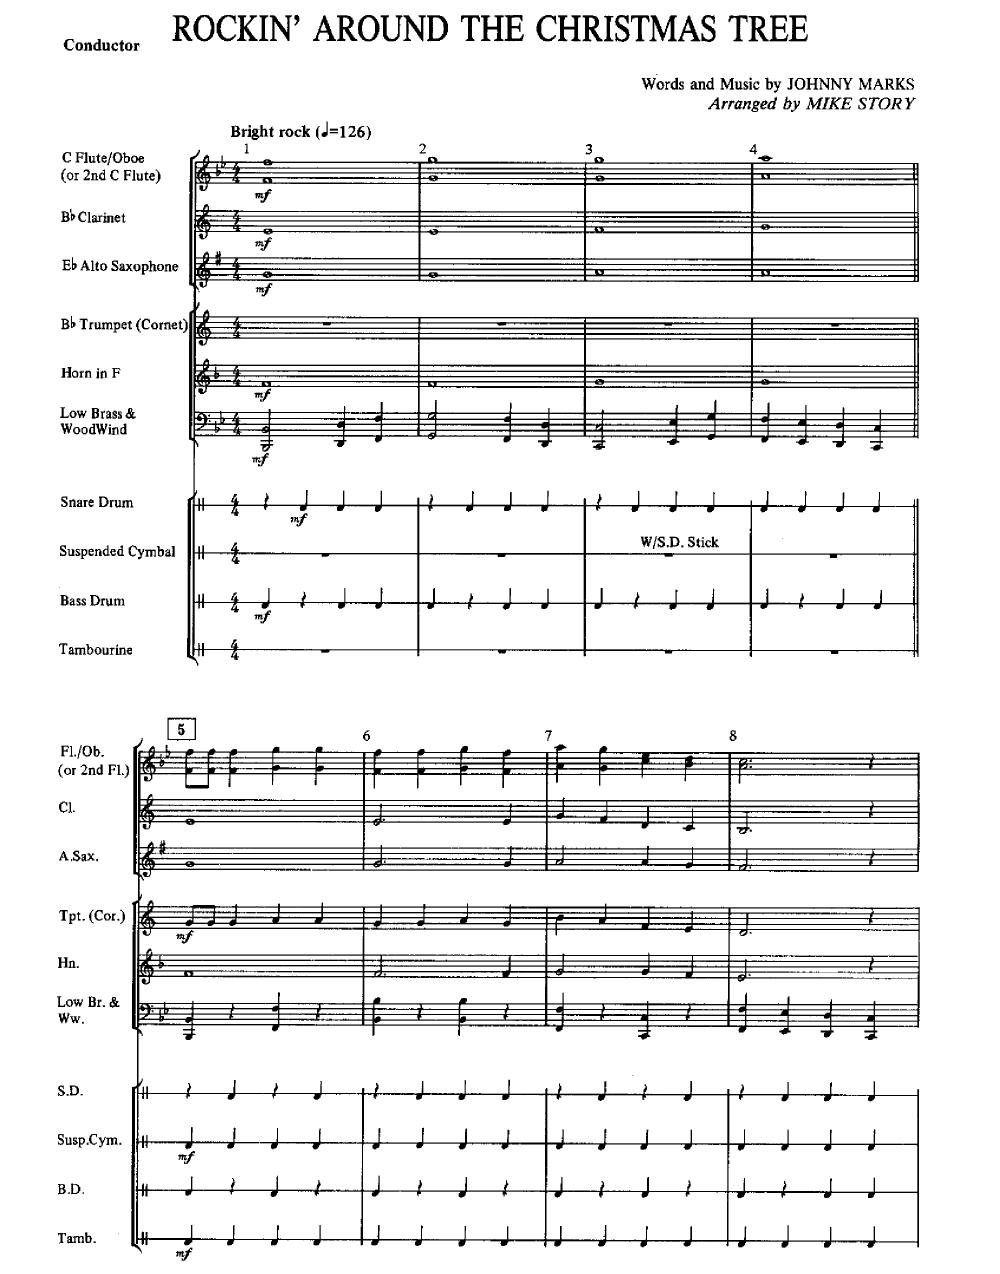 Rockin Around The Christmas Tree Piano Sheet Music.Rocking Around The Christmas Tree Arr Mike Story J W